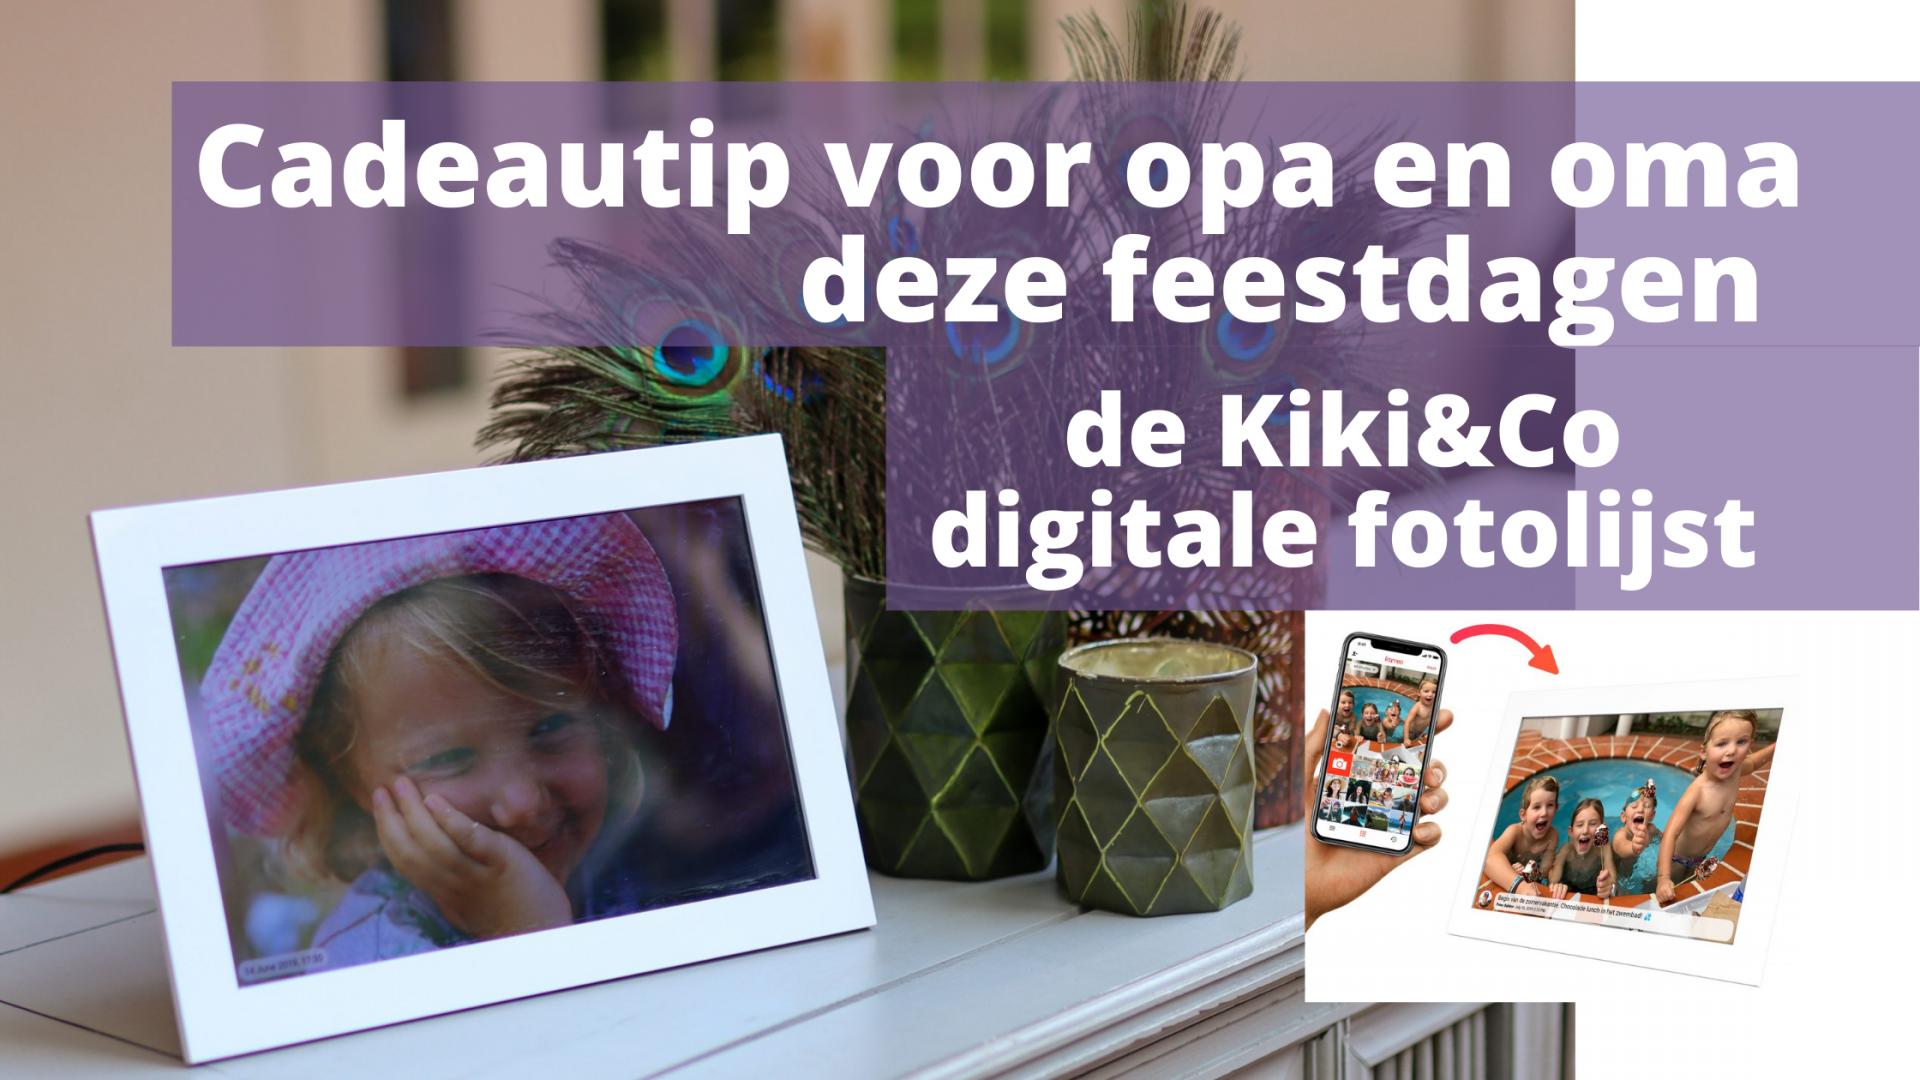 Cadeautip voor opa en oma; Kiki&Co digitale fotolijst